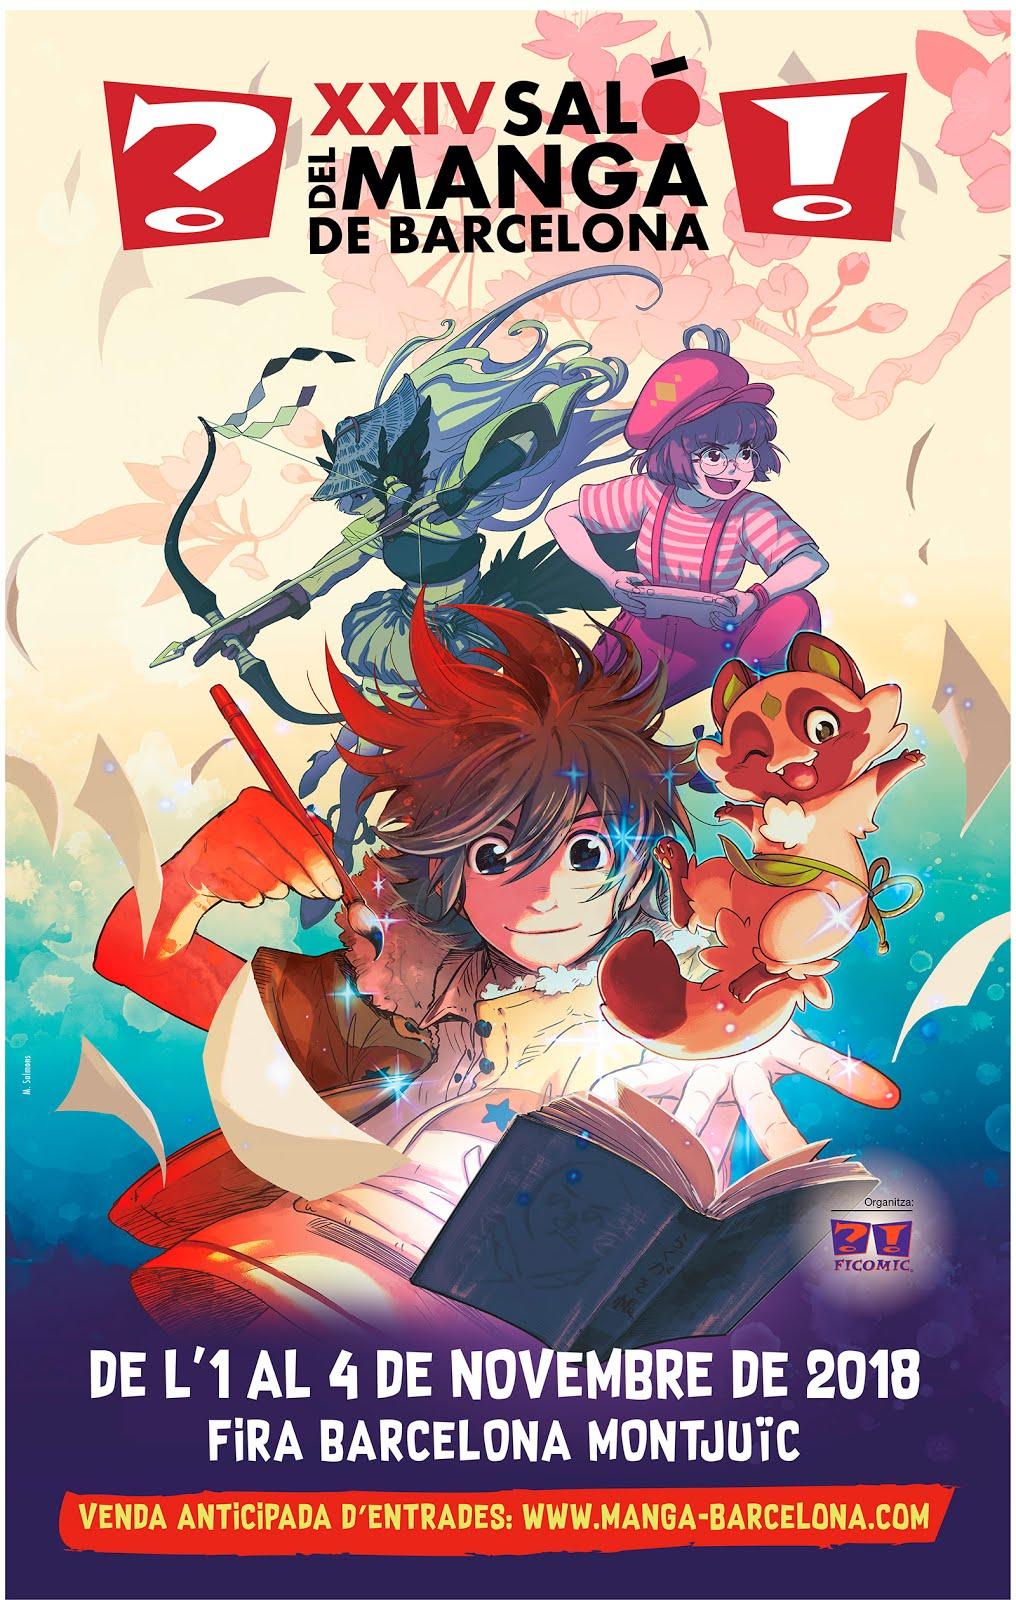 Asistiremos al XXIV Salón del Manga de Barcelona